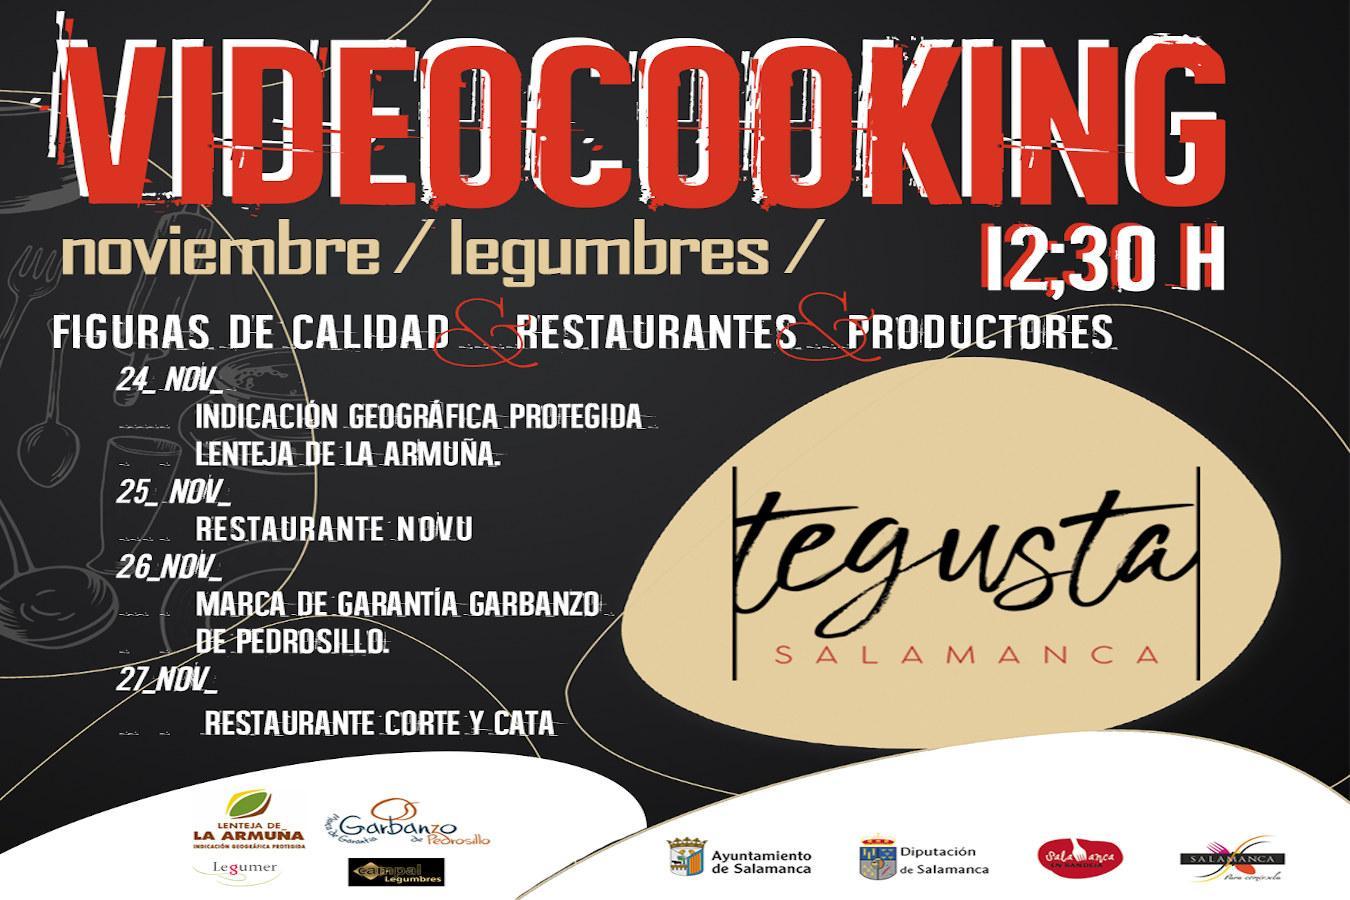 Noviembre: mes de las legumbres en TeGusta Salamanca